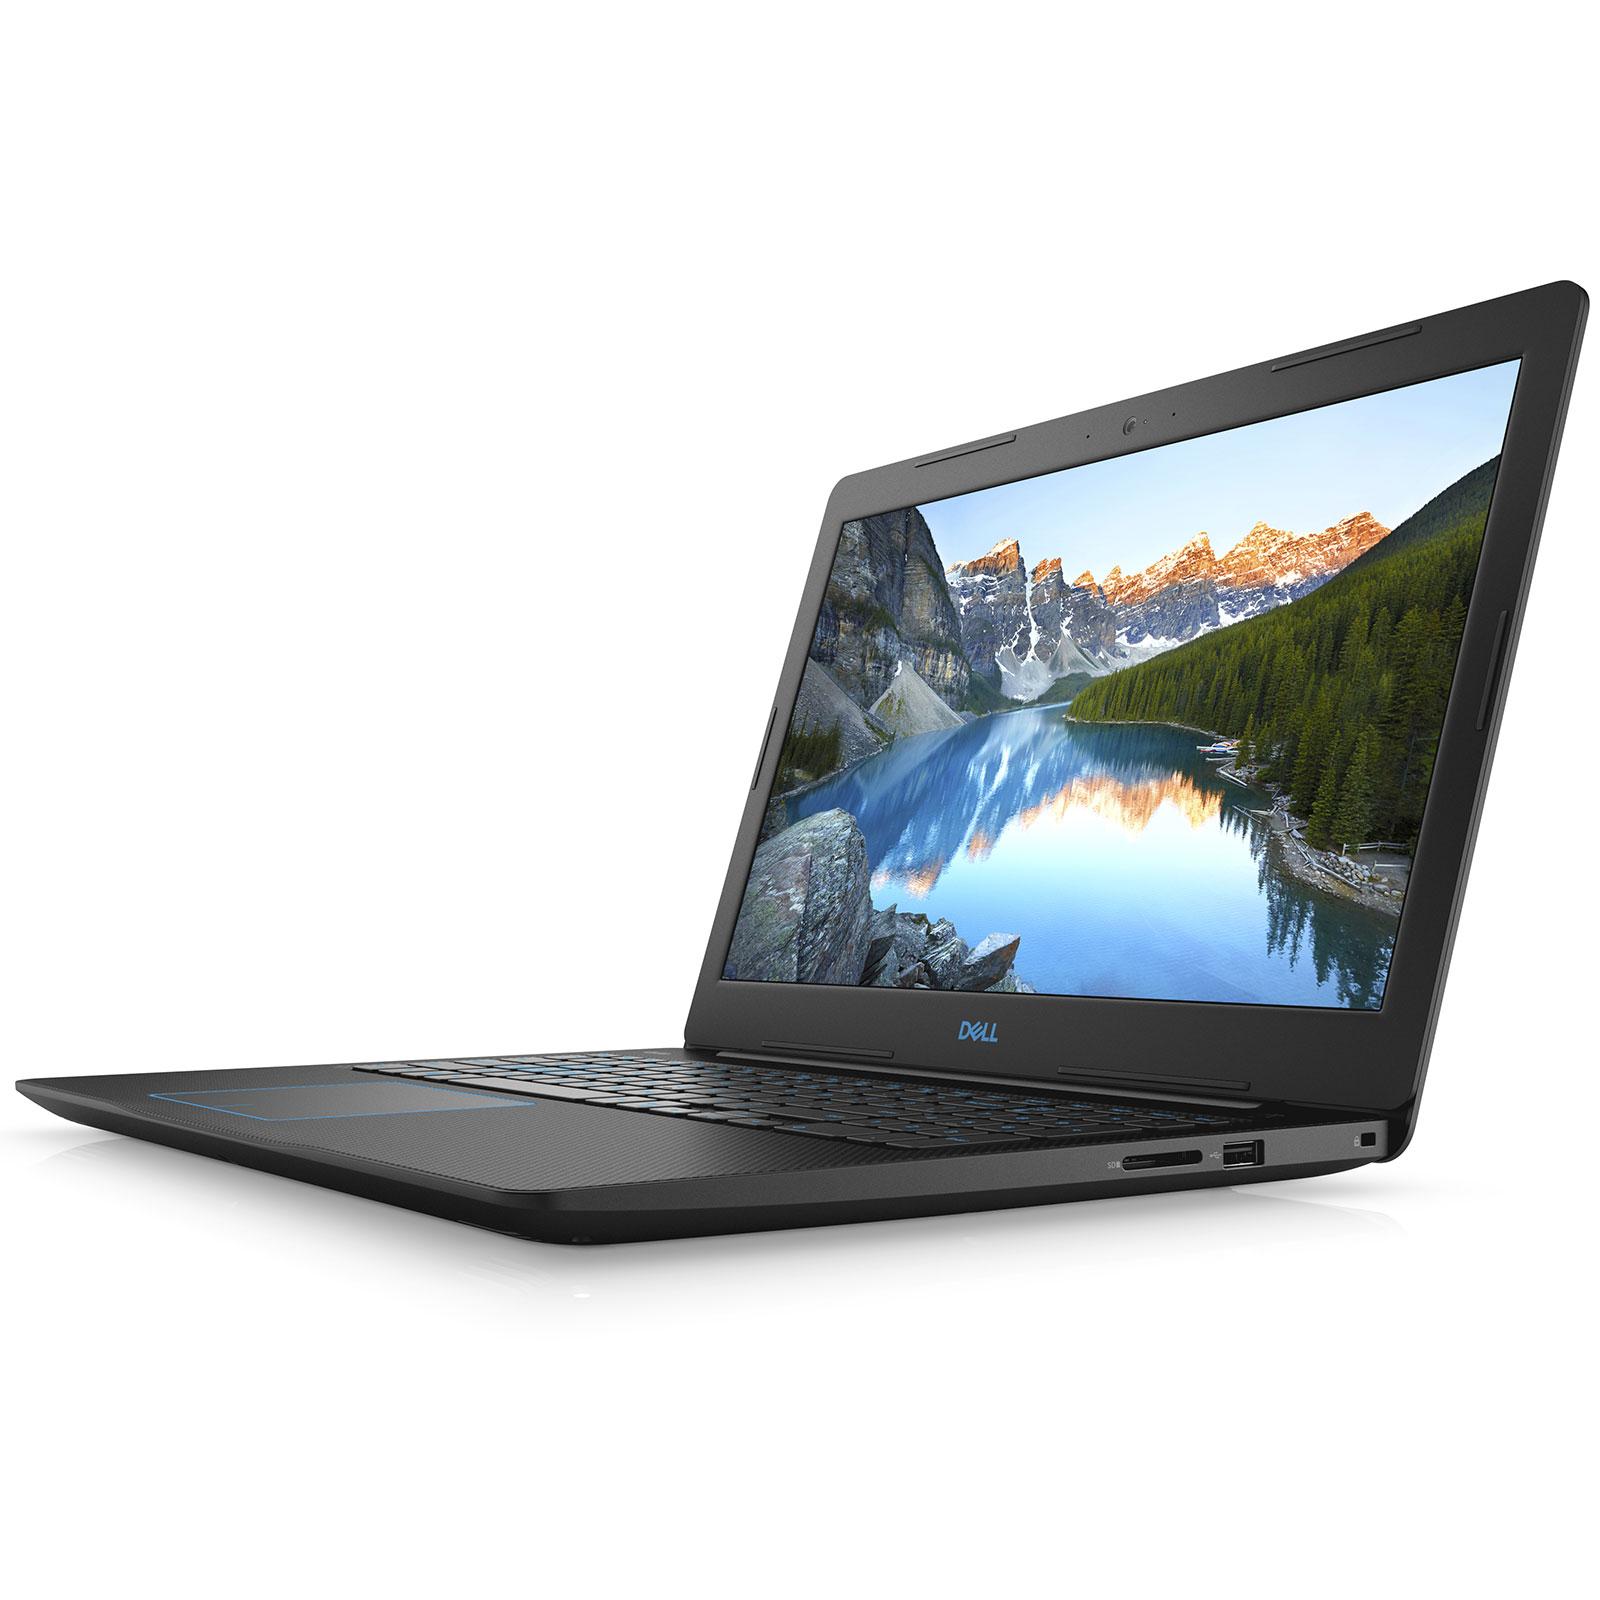 "PC Portable 15,6"" Dell G3 15-3579 - Full HD, i5-8300H, 8Go RAM, 256Go SSD, GTX 1050 4Go"